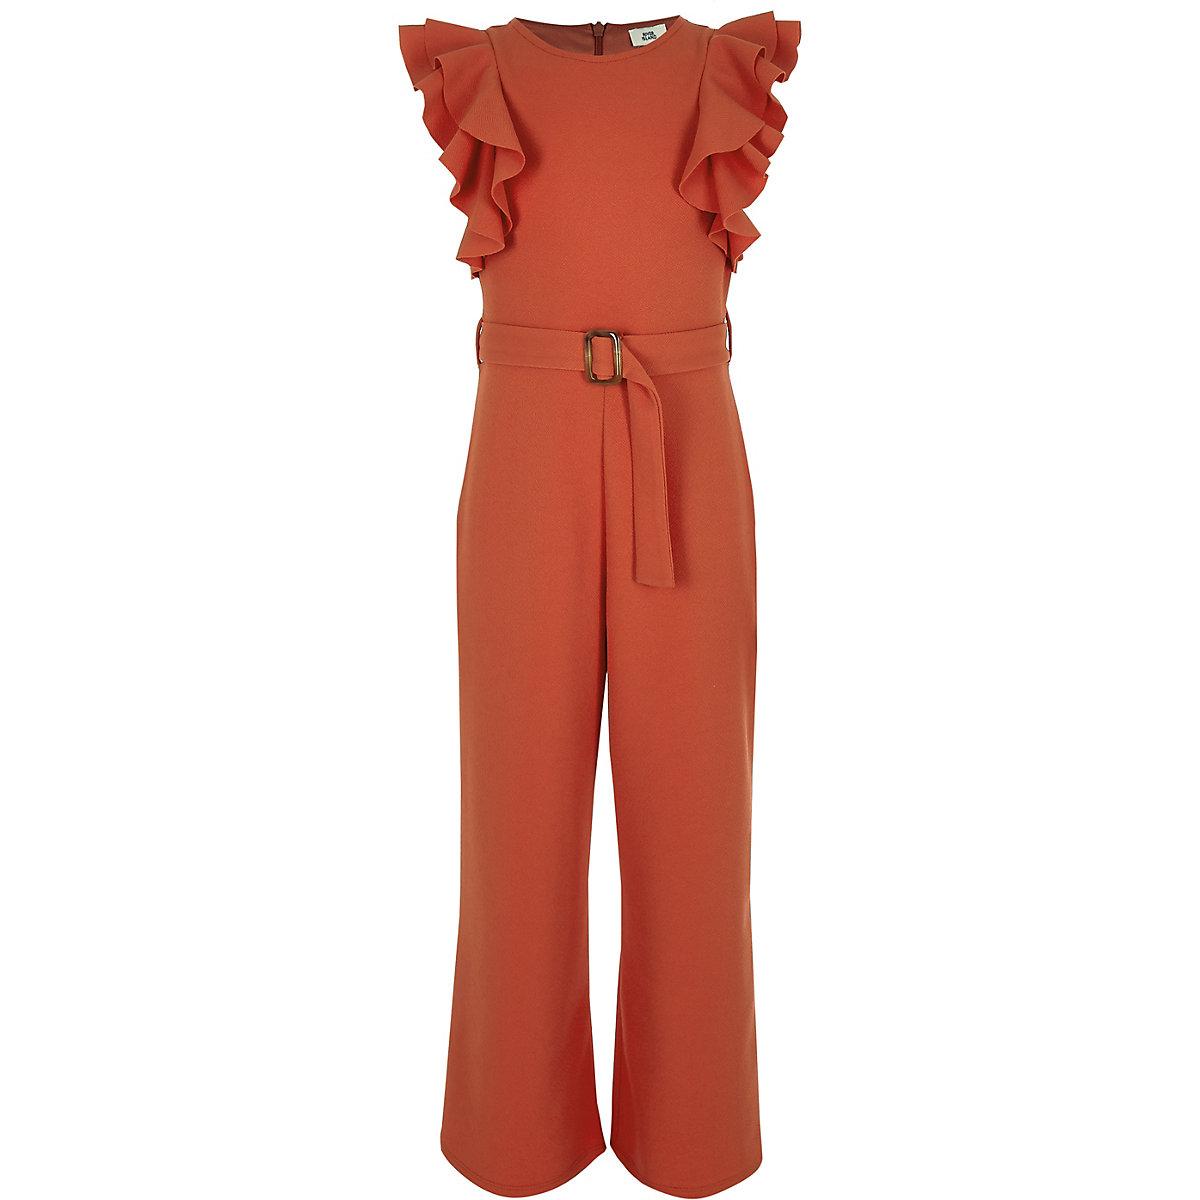 Girls red tie waist frill jumpsuit